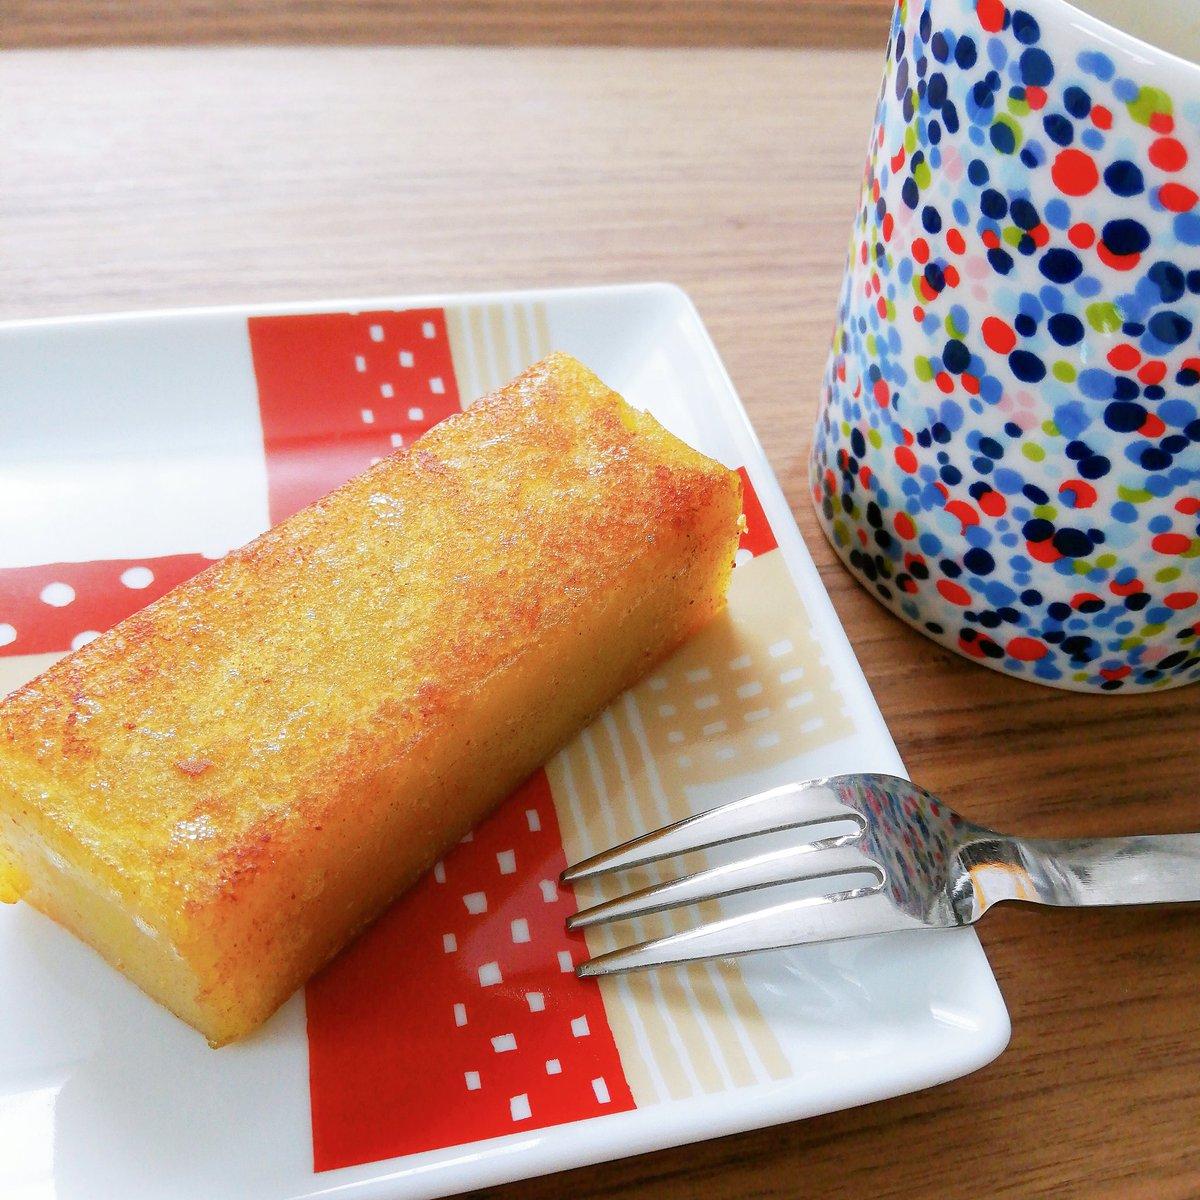 test ツイッターメディア - 初めて食べる舟和の芋ようかん、バターで焼いてみました! ほんとーーーーにおいしいーーーーー( ꈍᴗꈍ) https://t.co/LB5wkQXkET